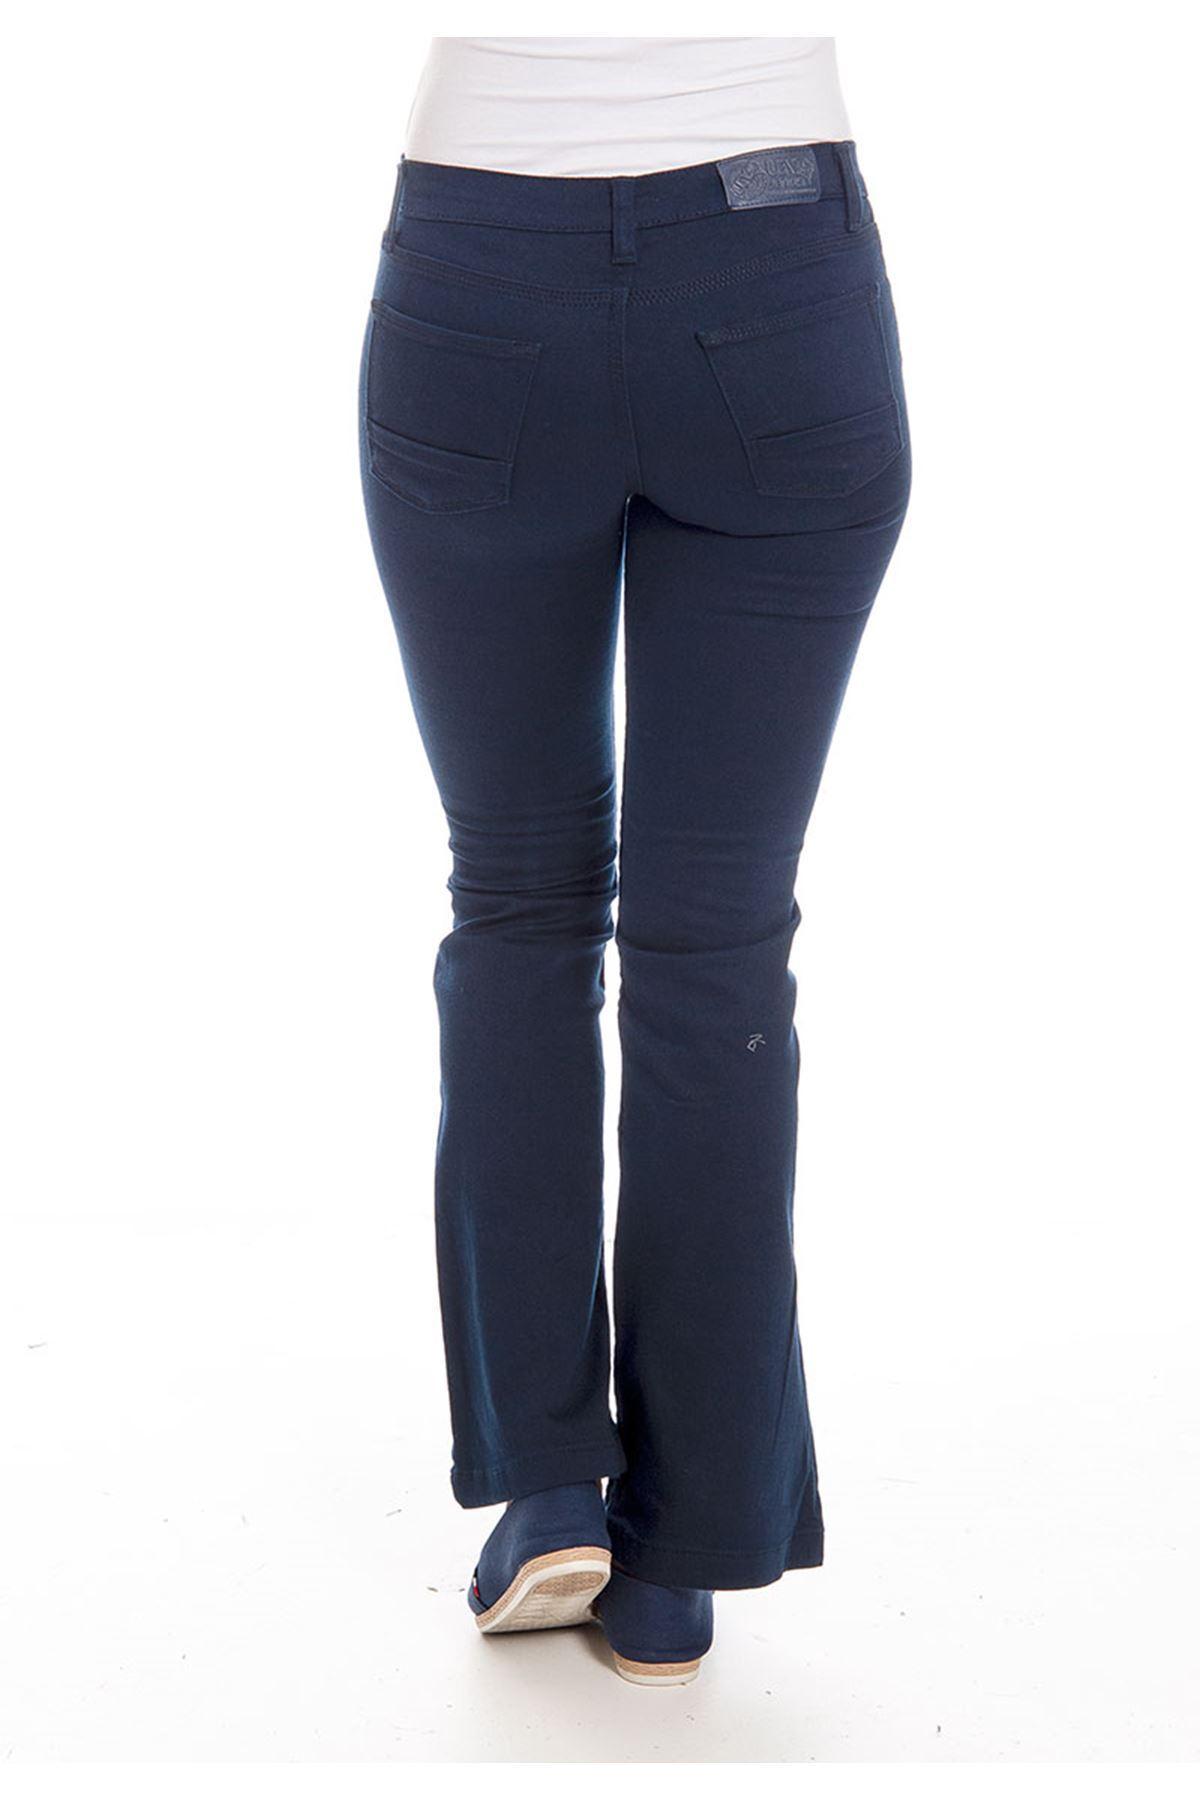 Lacivert İspanyol Paça Kadın Pantolon 4A-126109